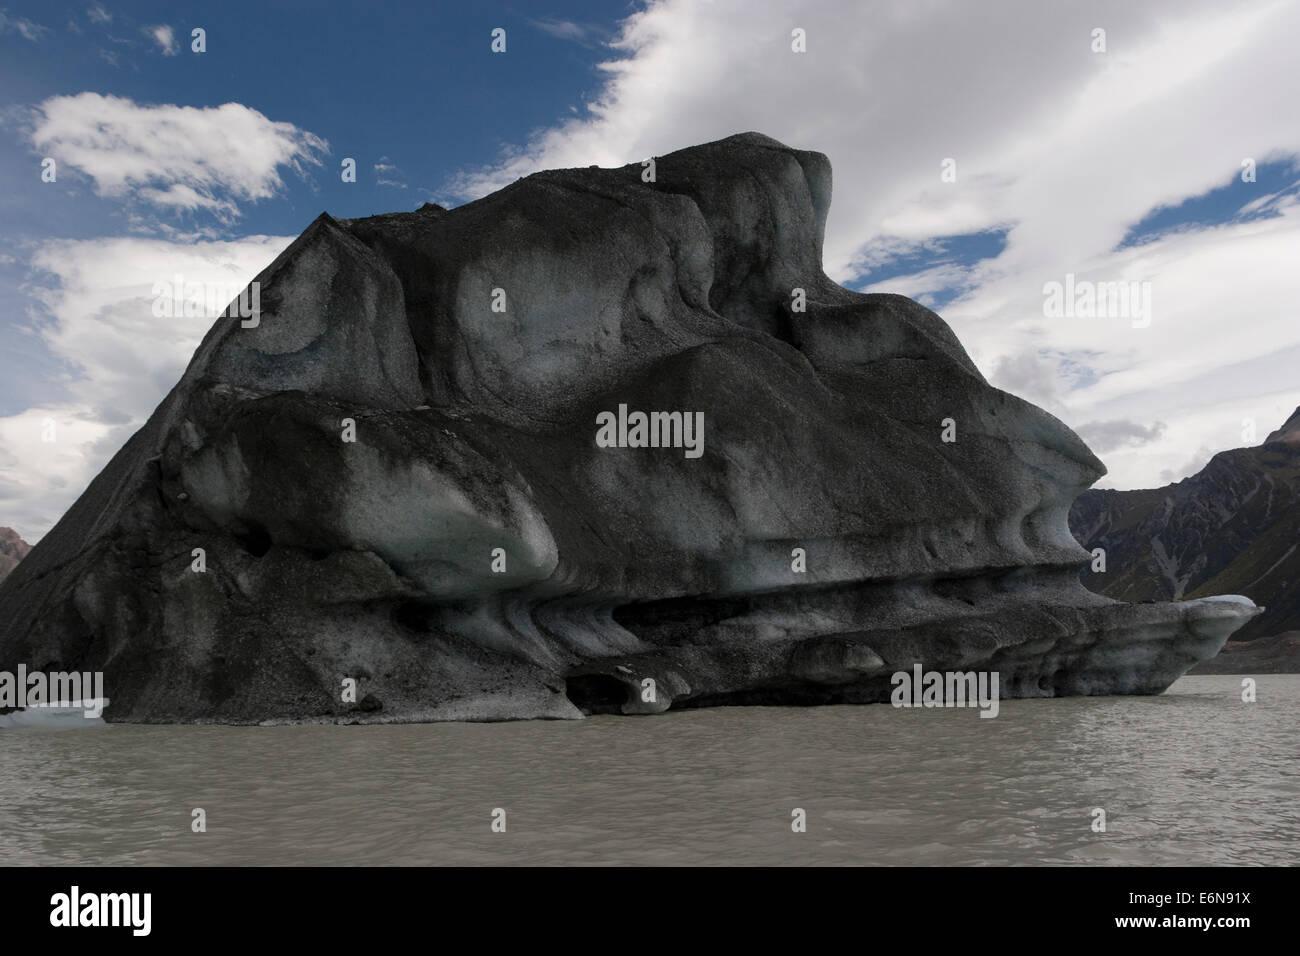 Glacial Ice berg, Mount Cook, New Zealand - Stock Image